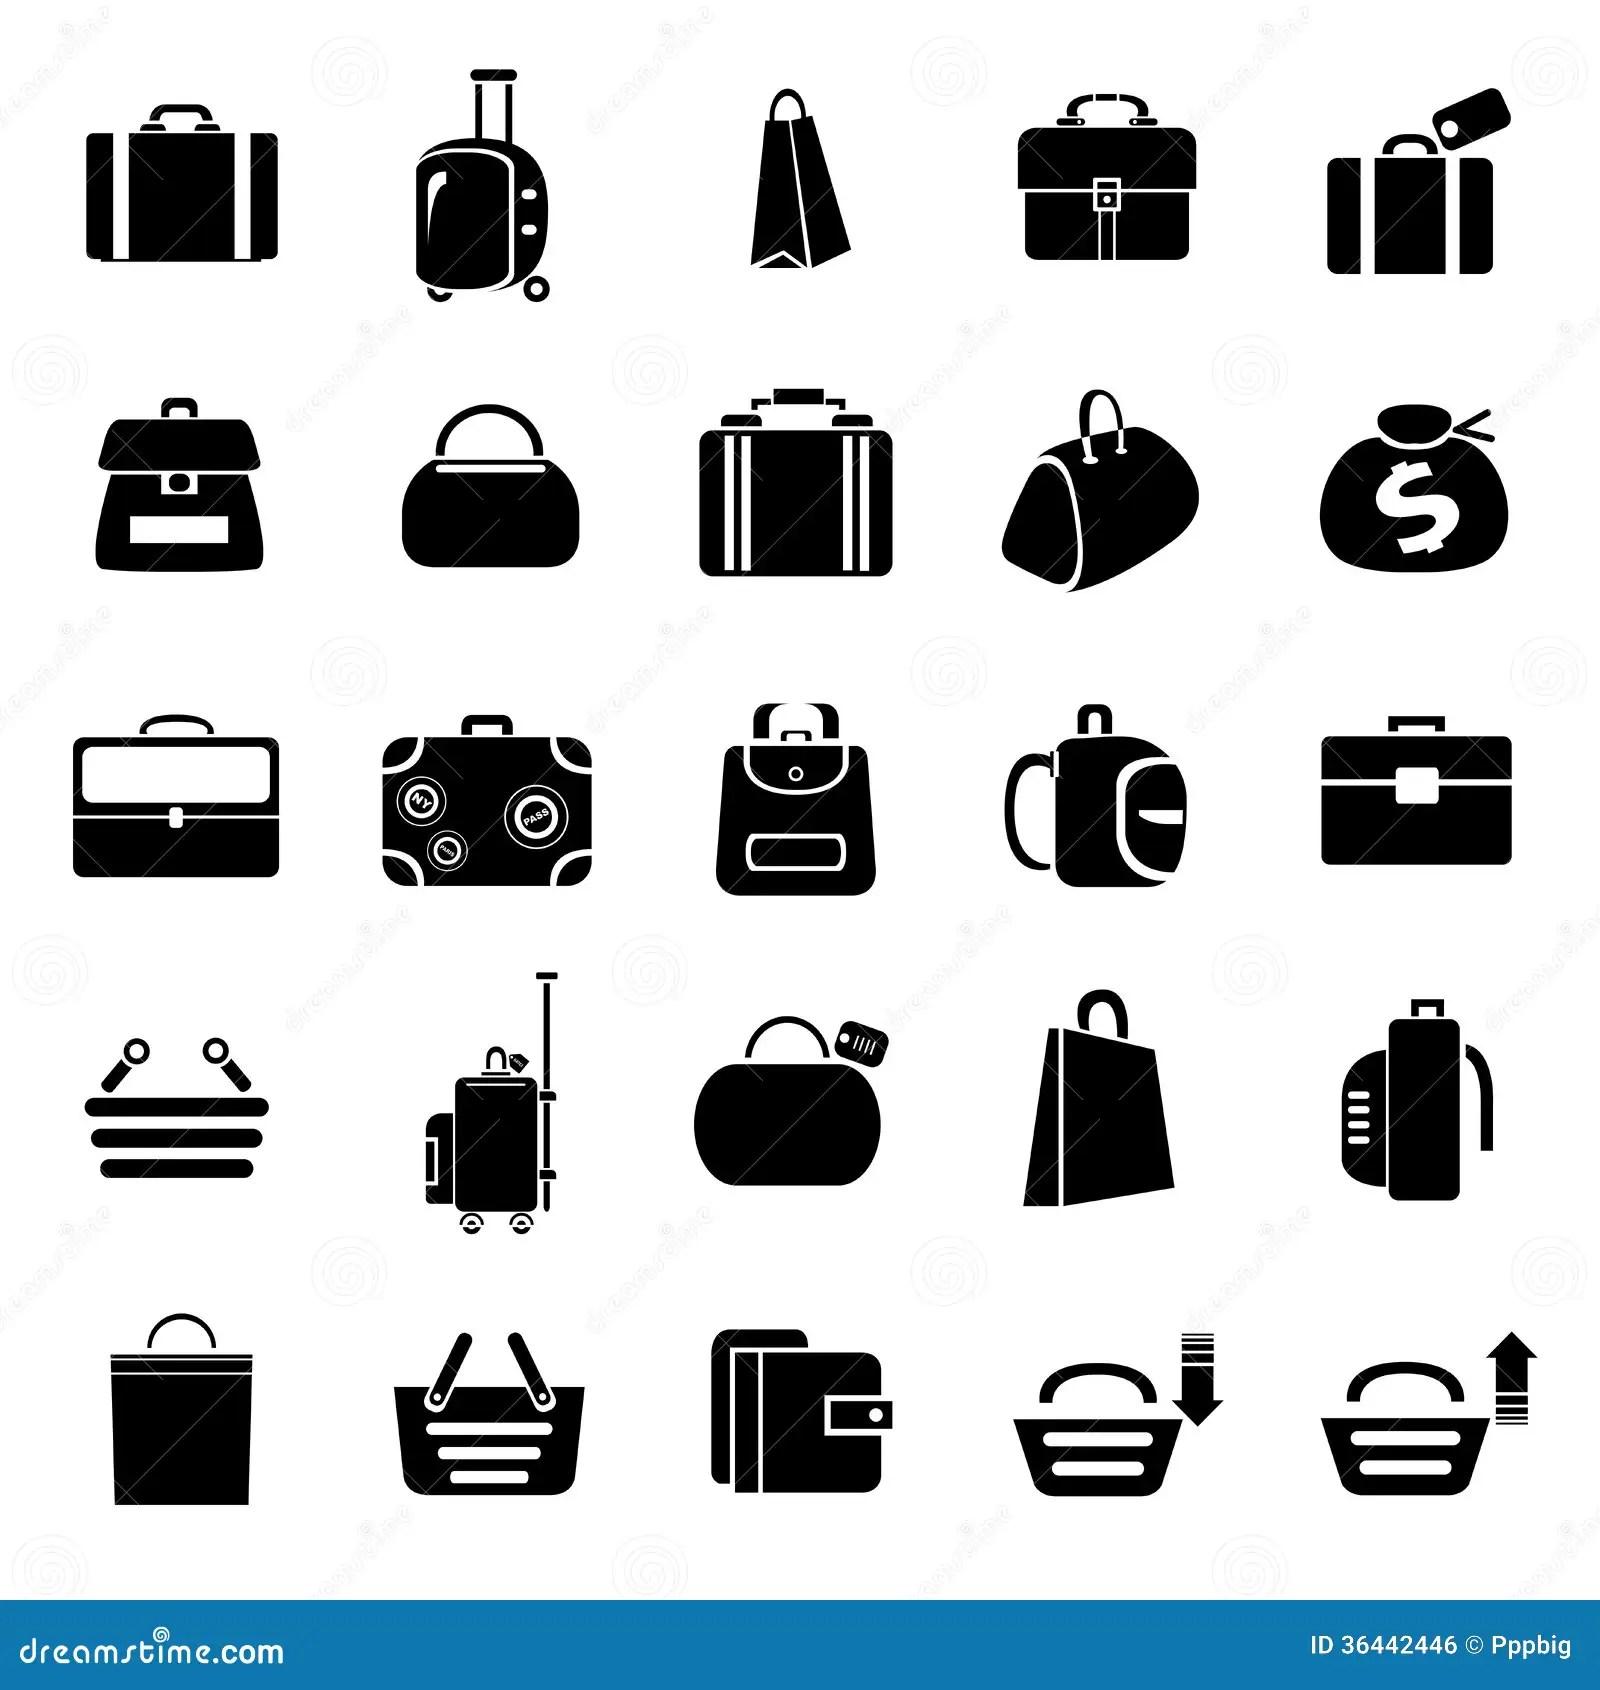 Bag Icons Royalty Free Stock Image